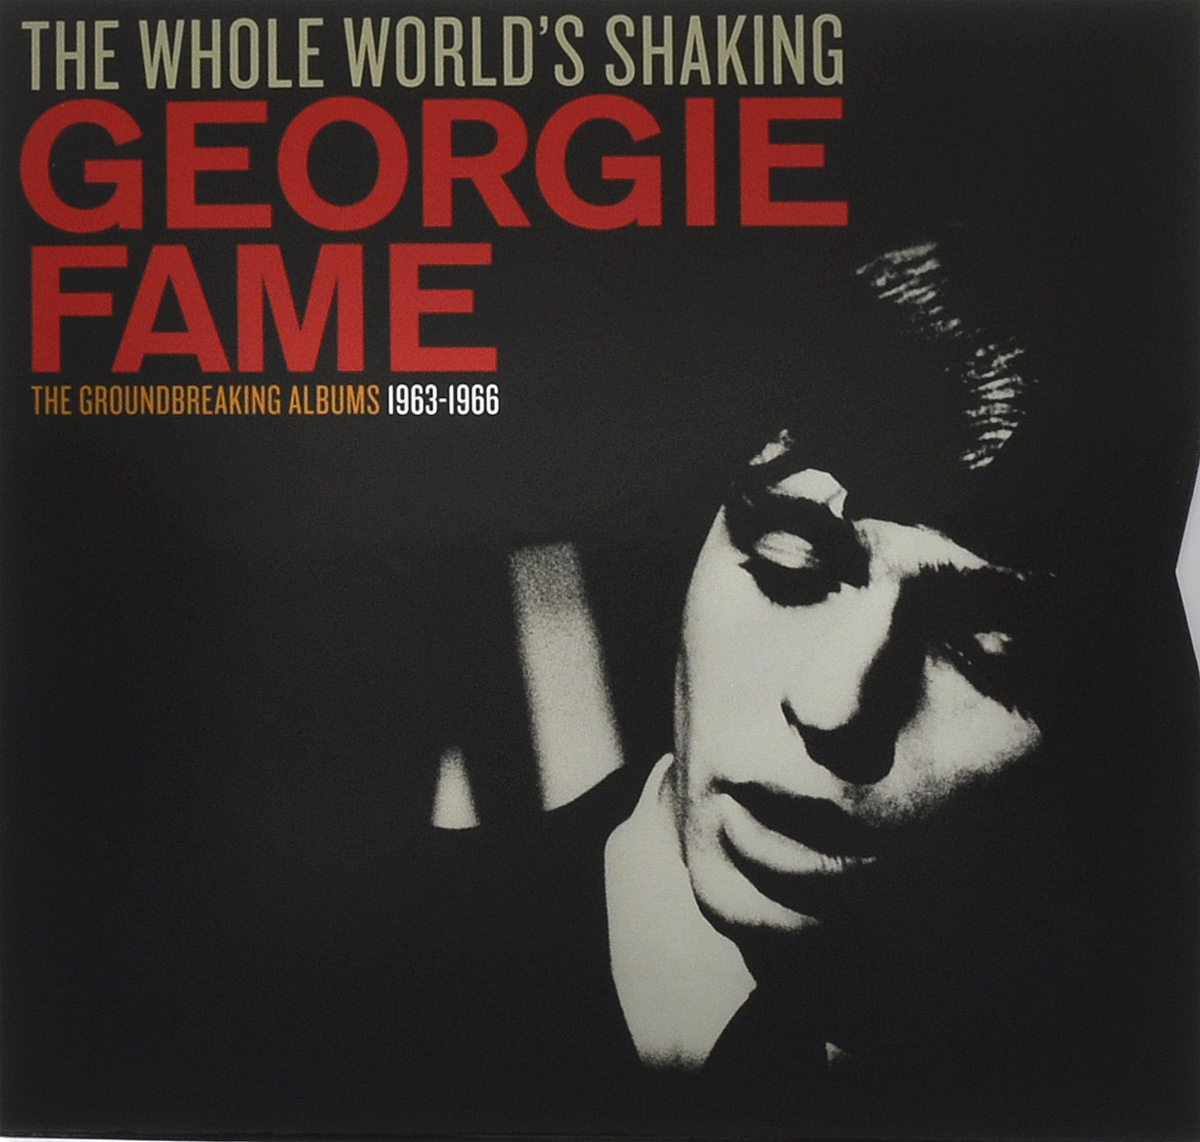 Джорджи Фэйм Georgie Fame. The Whole World's Shaking. The Groundbreaking Albums 1963-1966 (4 LP) кендрик ламар kendrick lamar damn 2 lp